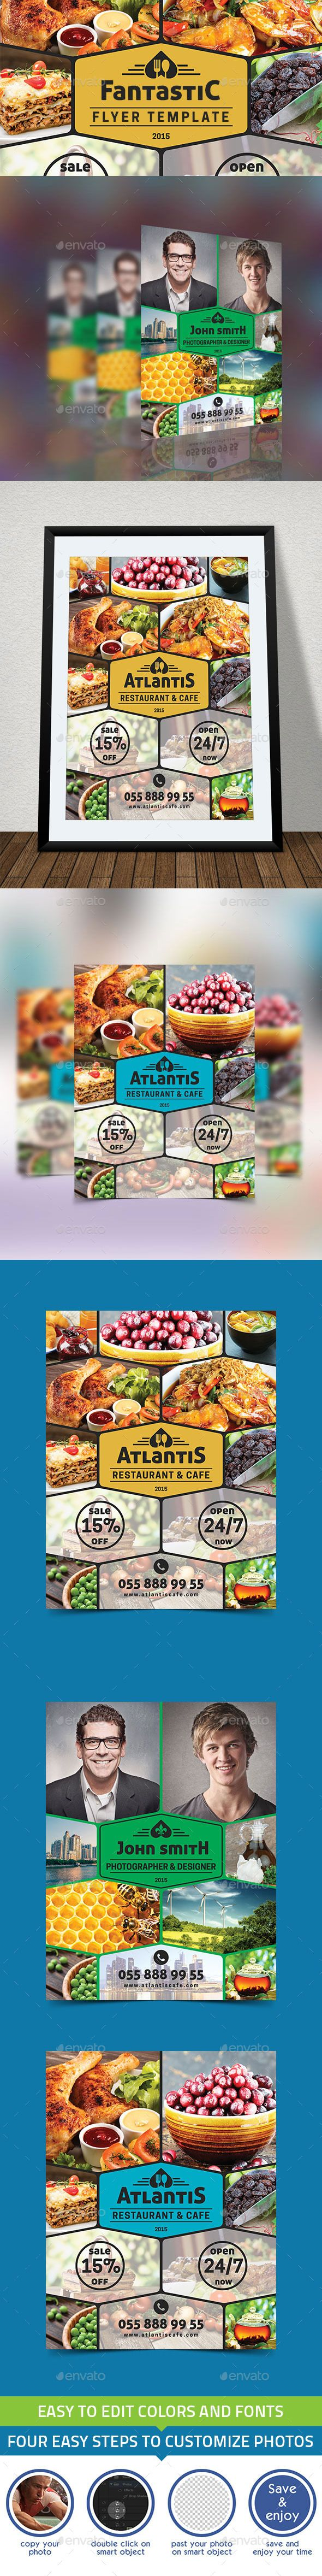 Fantasic Flyer Template | Download: http://graphicriver.net/item/fantasic-flyer-template/10349709?ref=ksioks